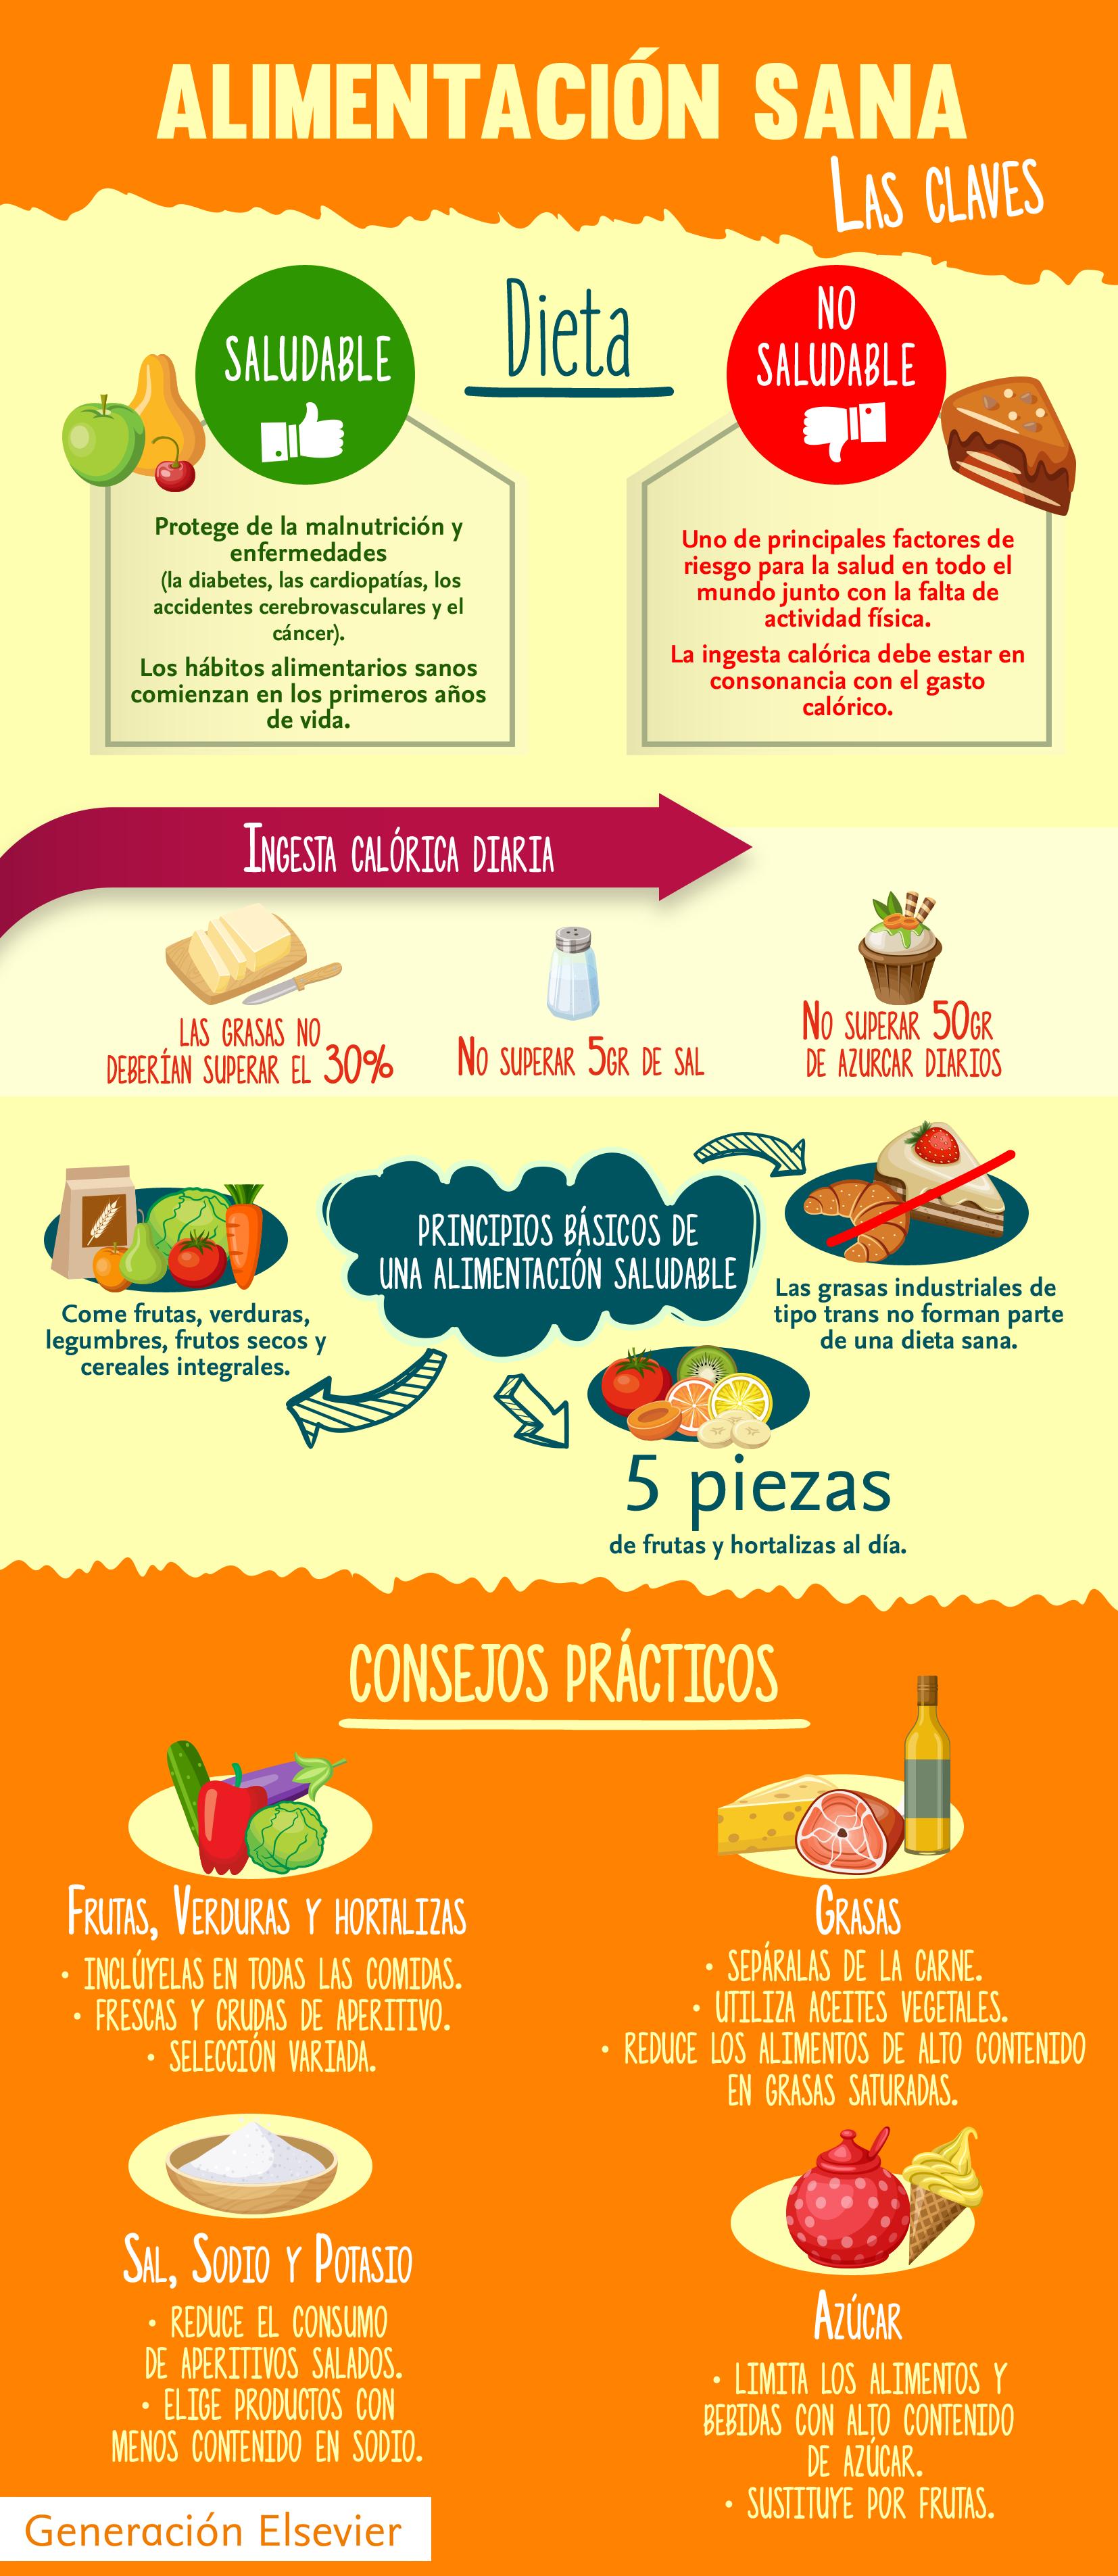 dieta alimenticia para una alimentacion saludable